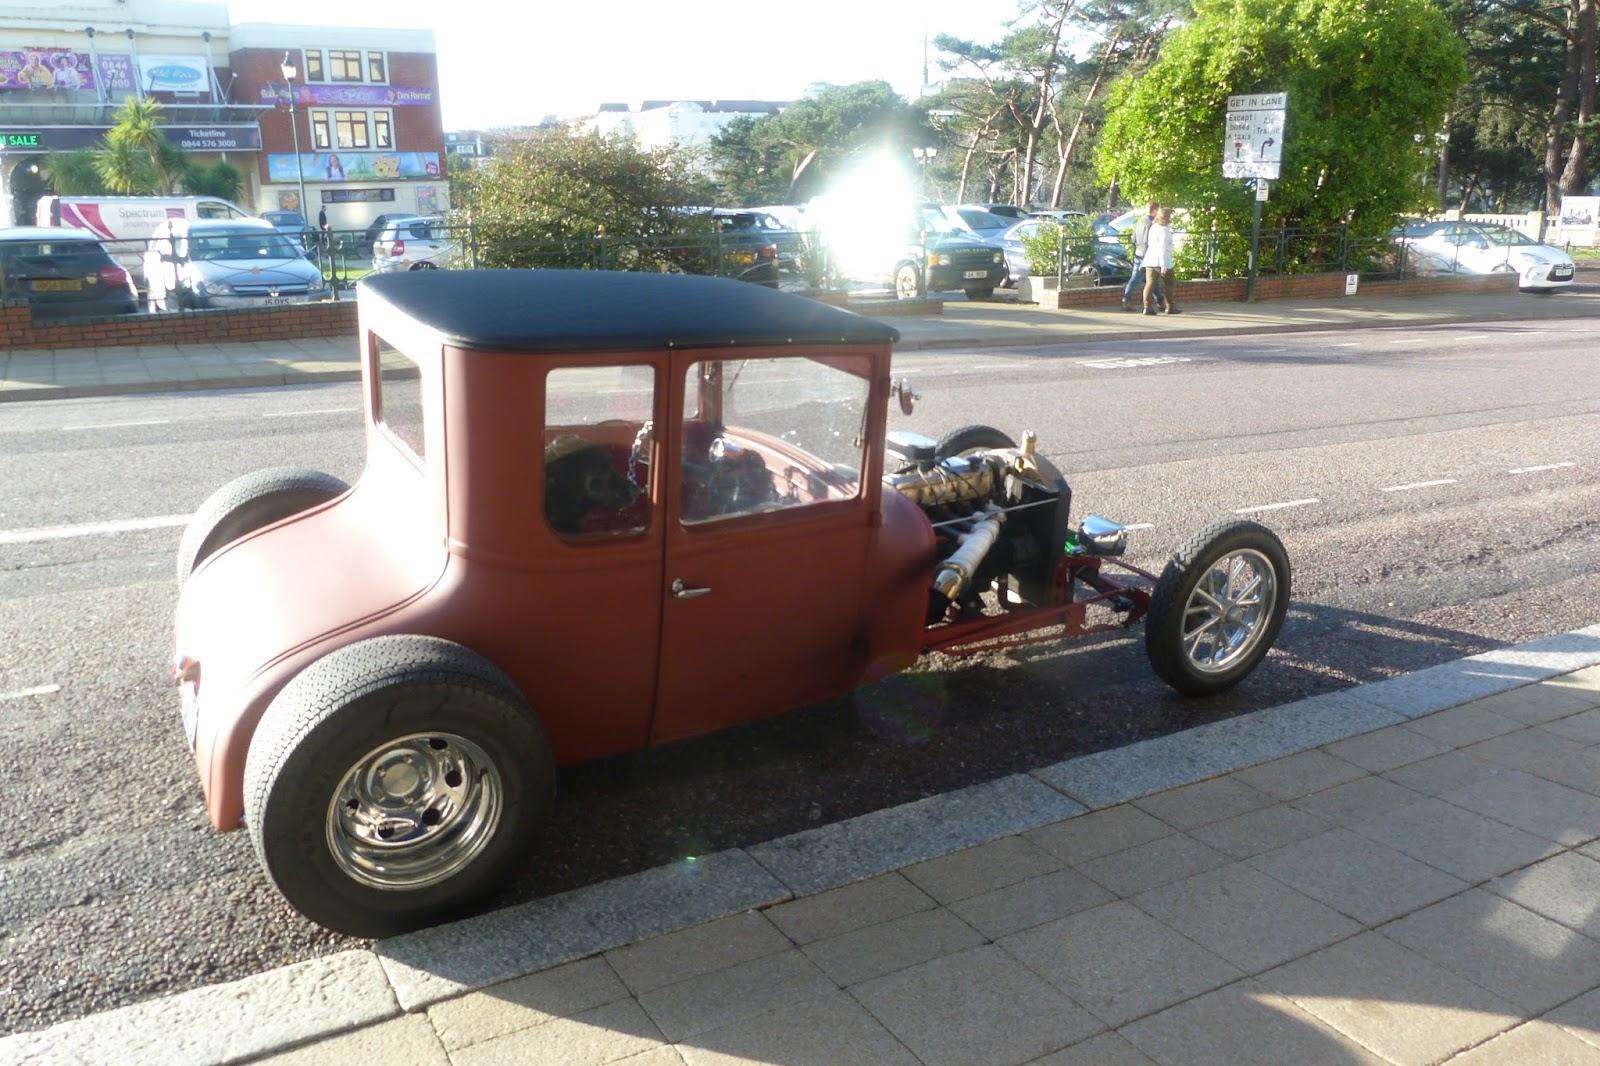 Modern Model T Hot Rod For Sale Ornament - Classic Cars Ideas - boiq ...